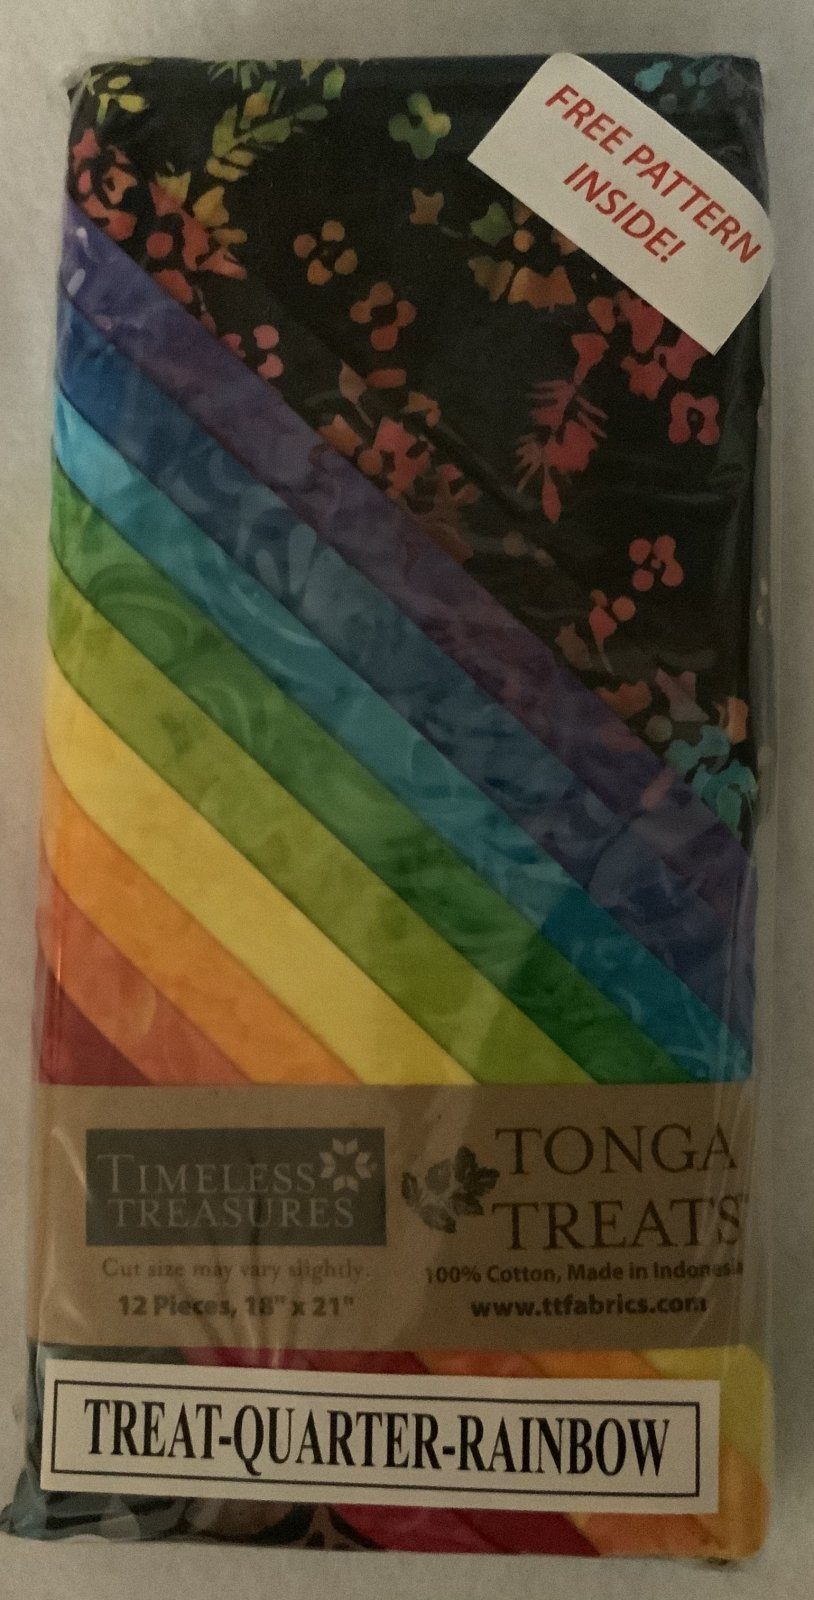 Tonga Treat Fat Quarters Rainbow (18in x 21in) 12pcs - Timeless Treasures